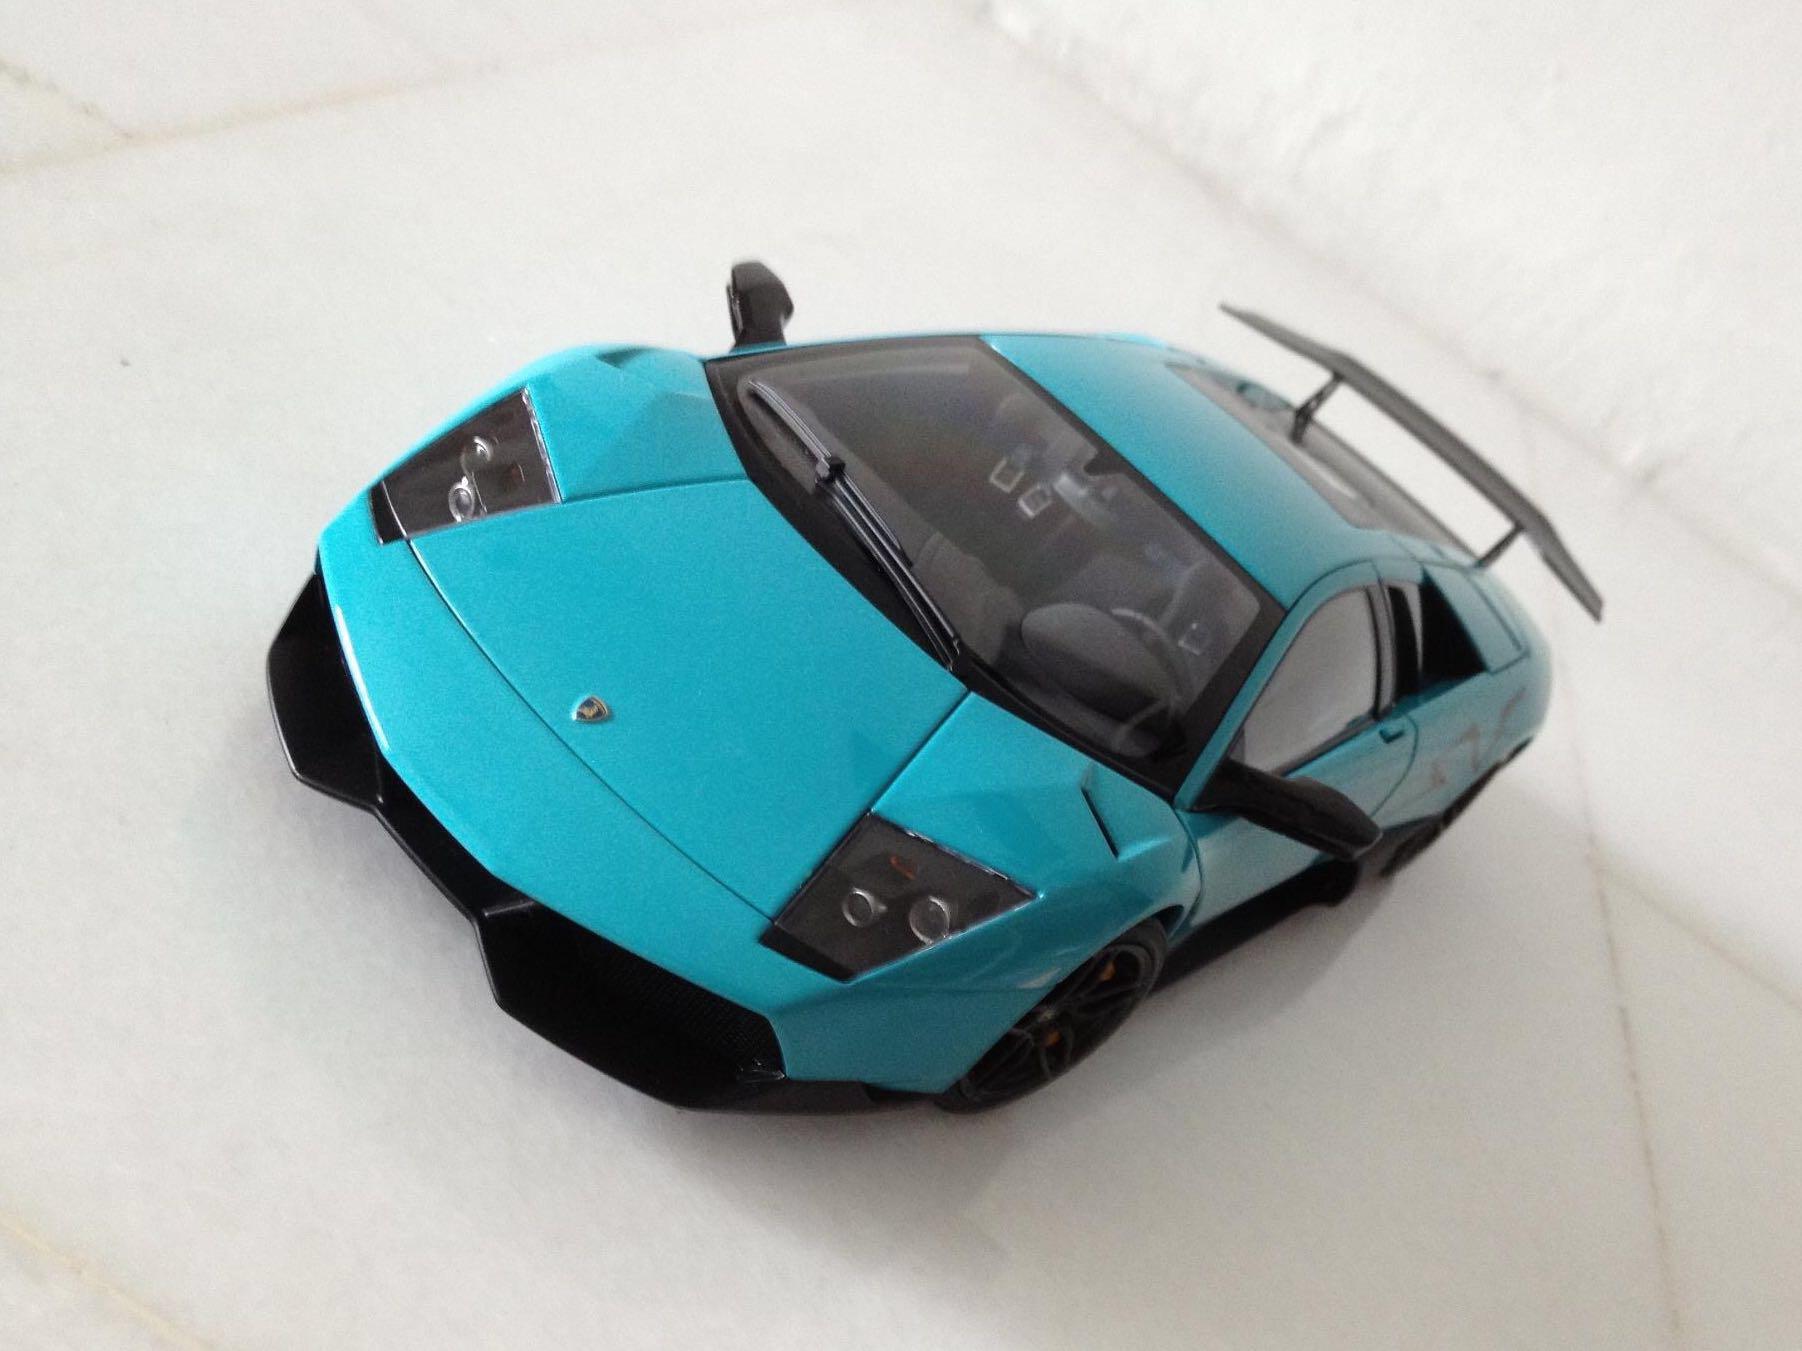 1 18 Autoart Lamborghini Murcielago Sv Turquoise Toys Games